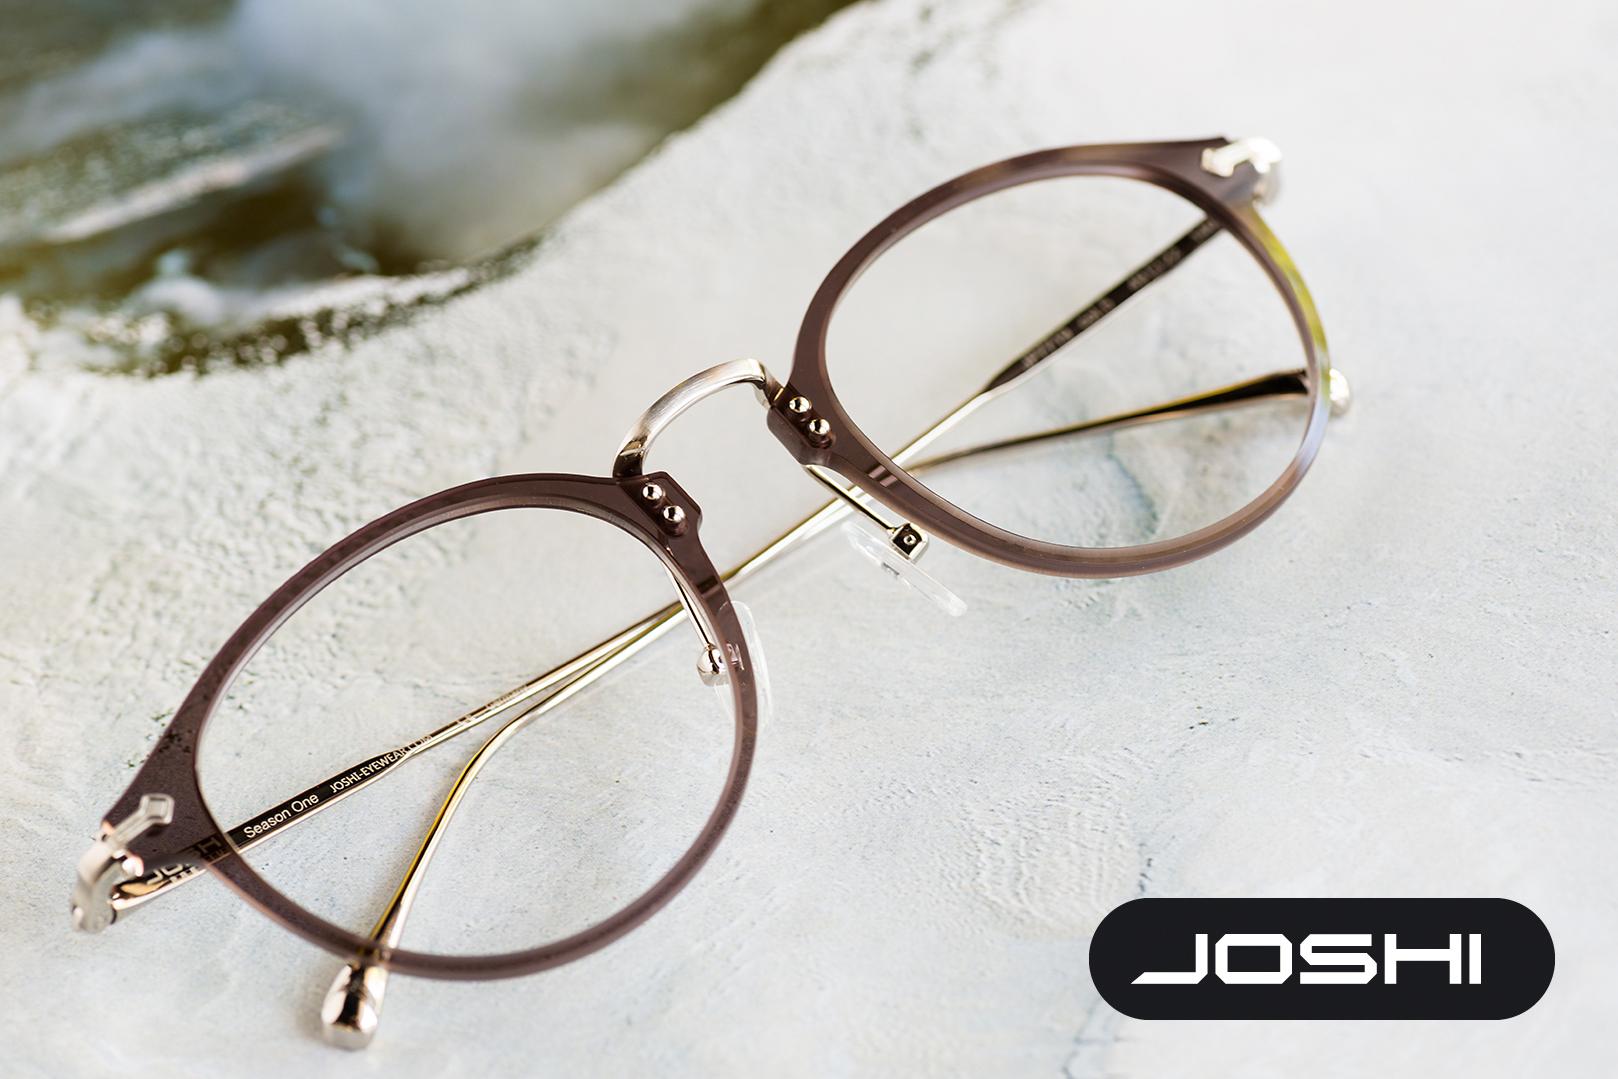 Joshi Eyewear by Kruytzer TREND EYES FW17-18_10.jpg